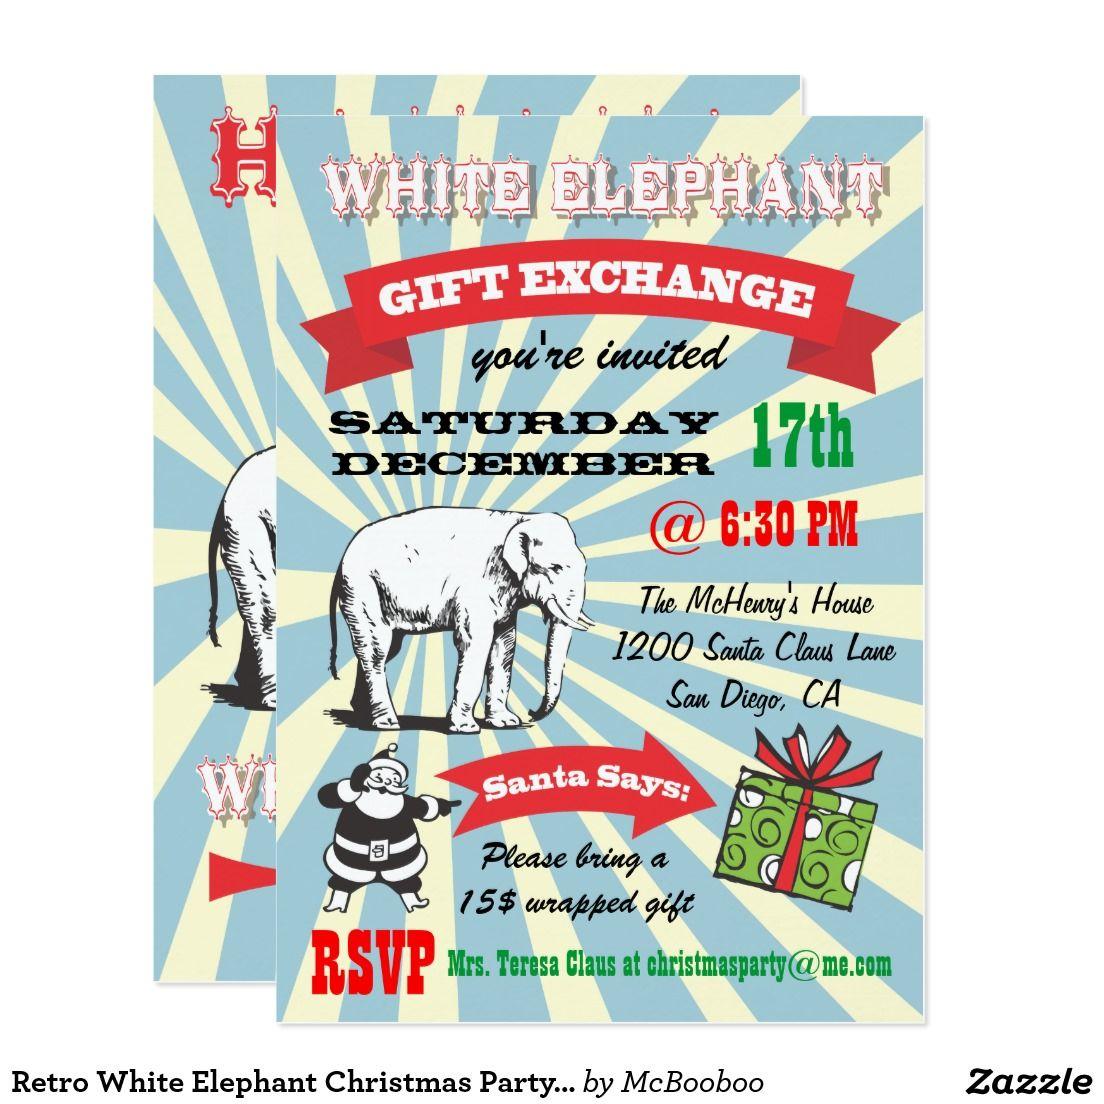 Retro White Elephant Christmas Party Invitations   Zazzle.com ...